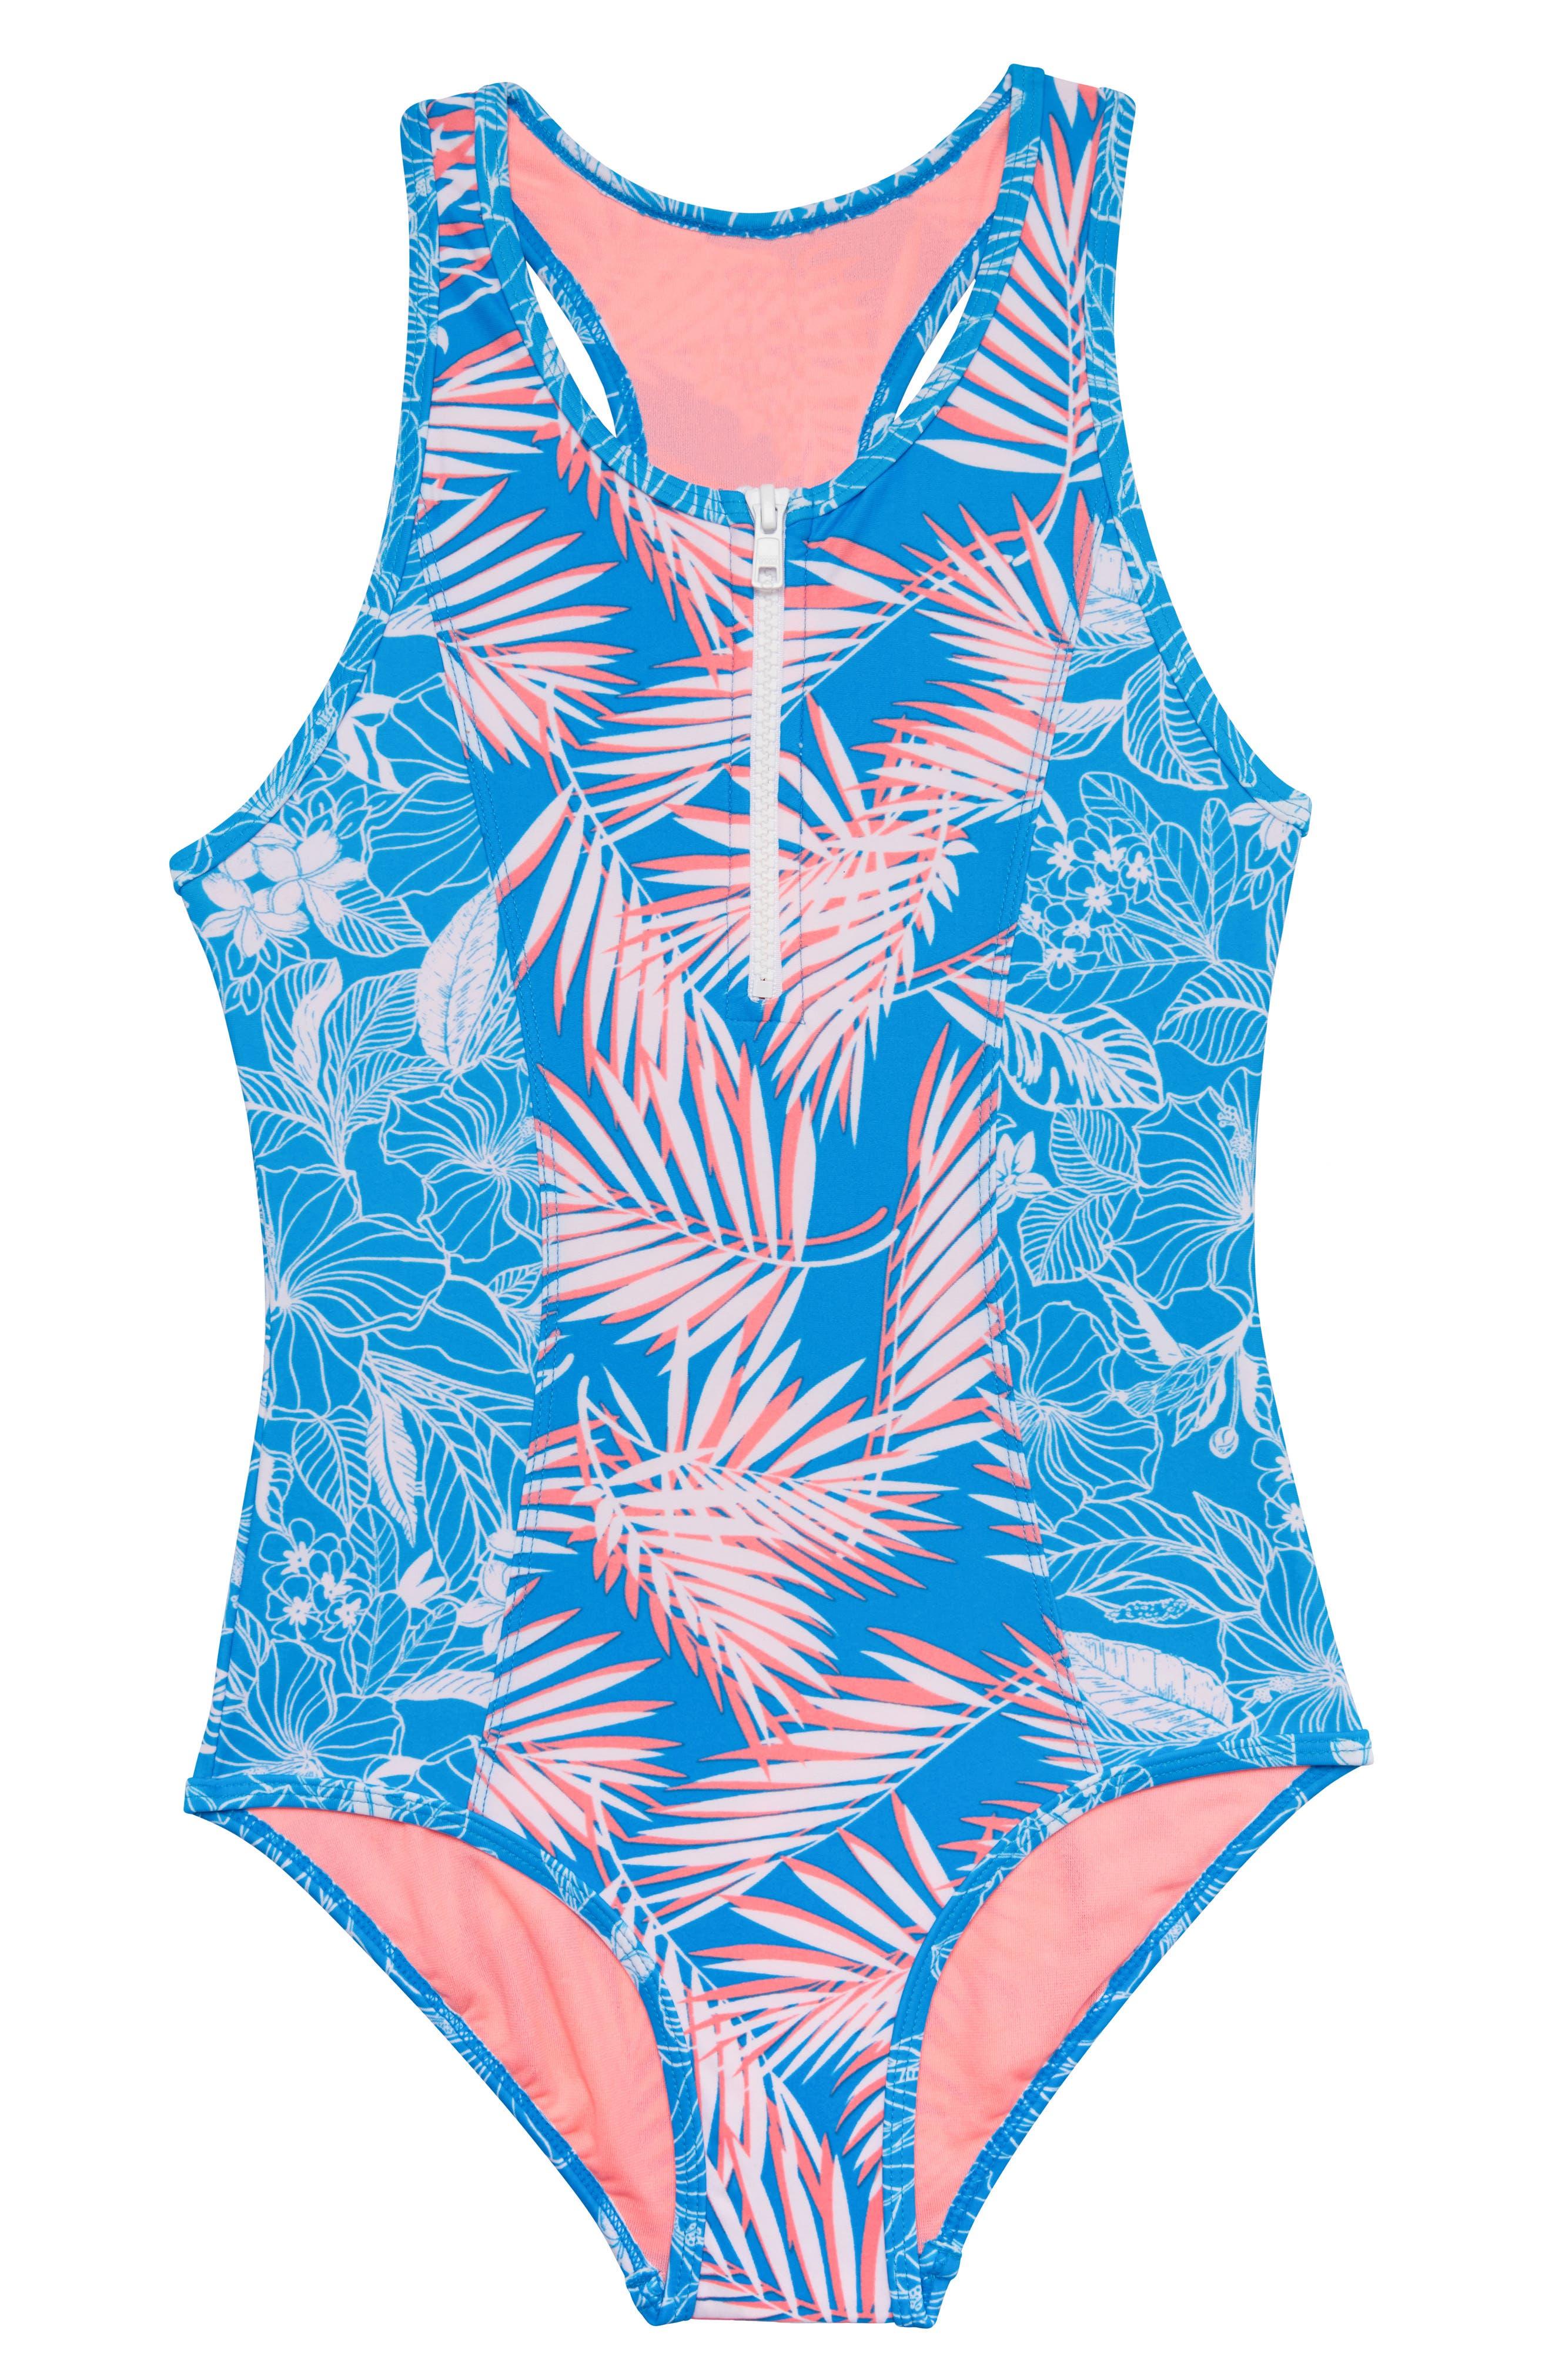 d4ce35c19a2 Girl's Gossip Girl Cruise Along One-Piece Swimsuit, Blue